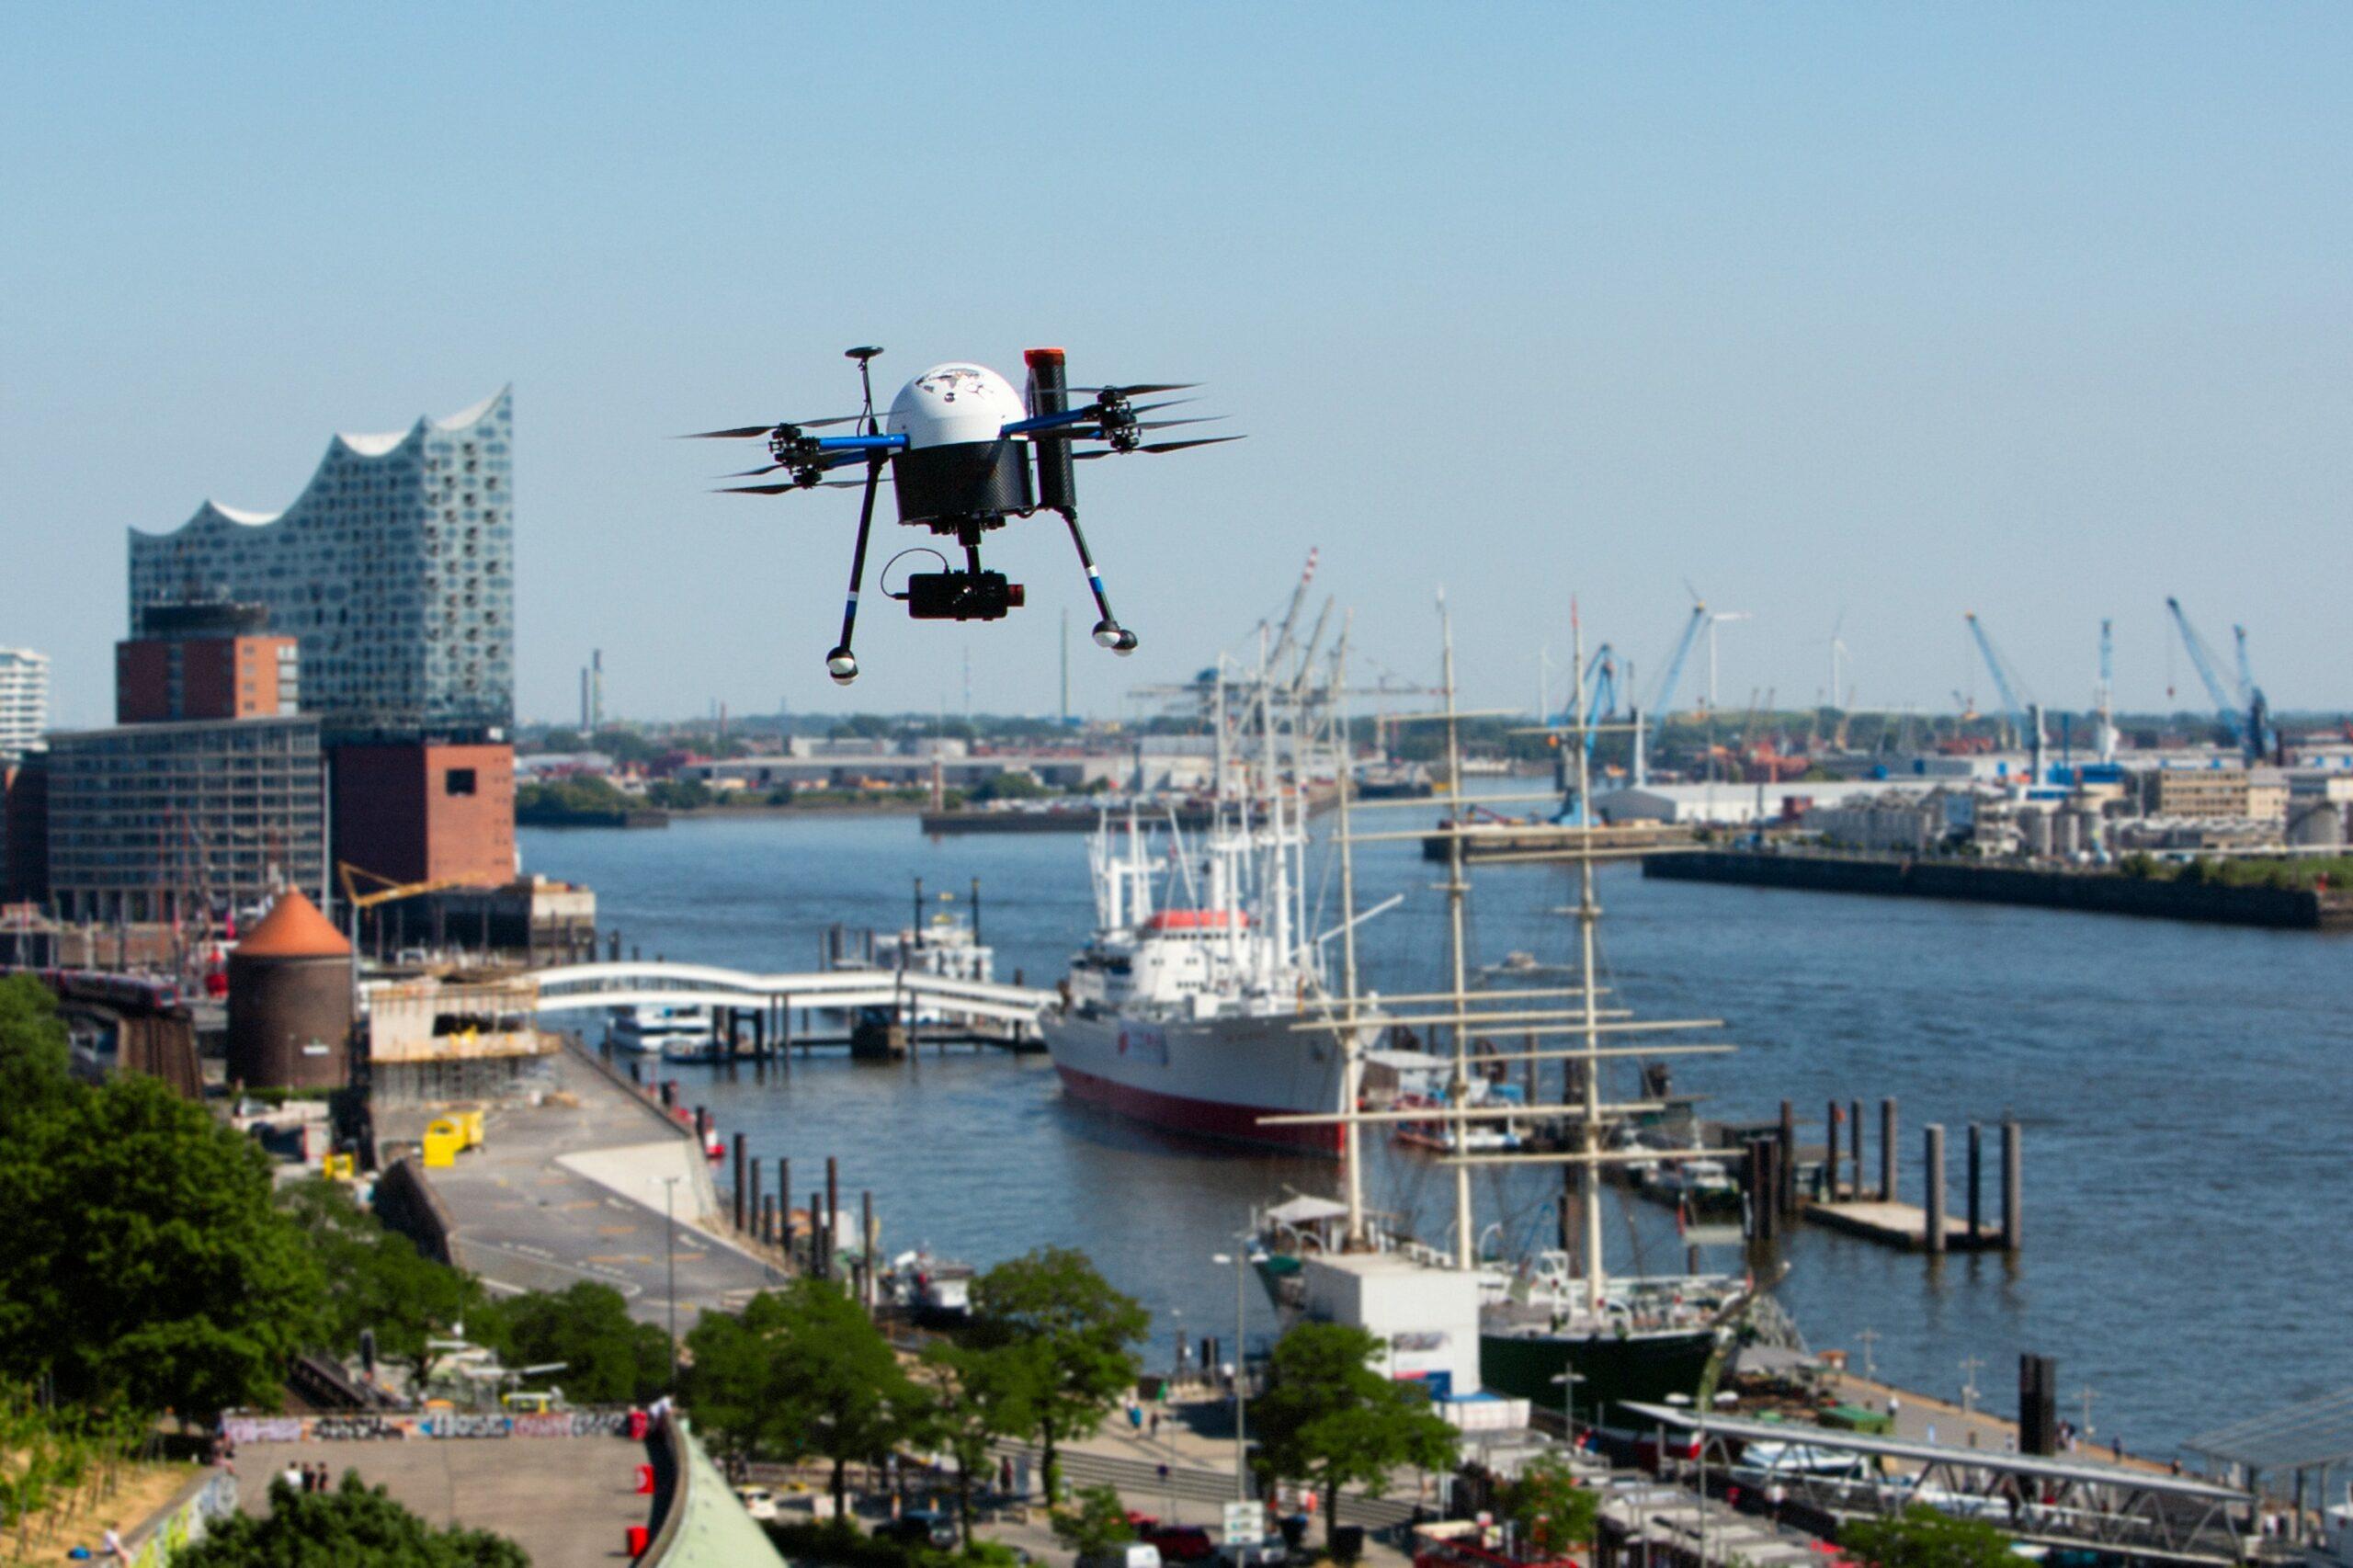 Port of Hamburg hosts drone system pilot